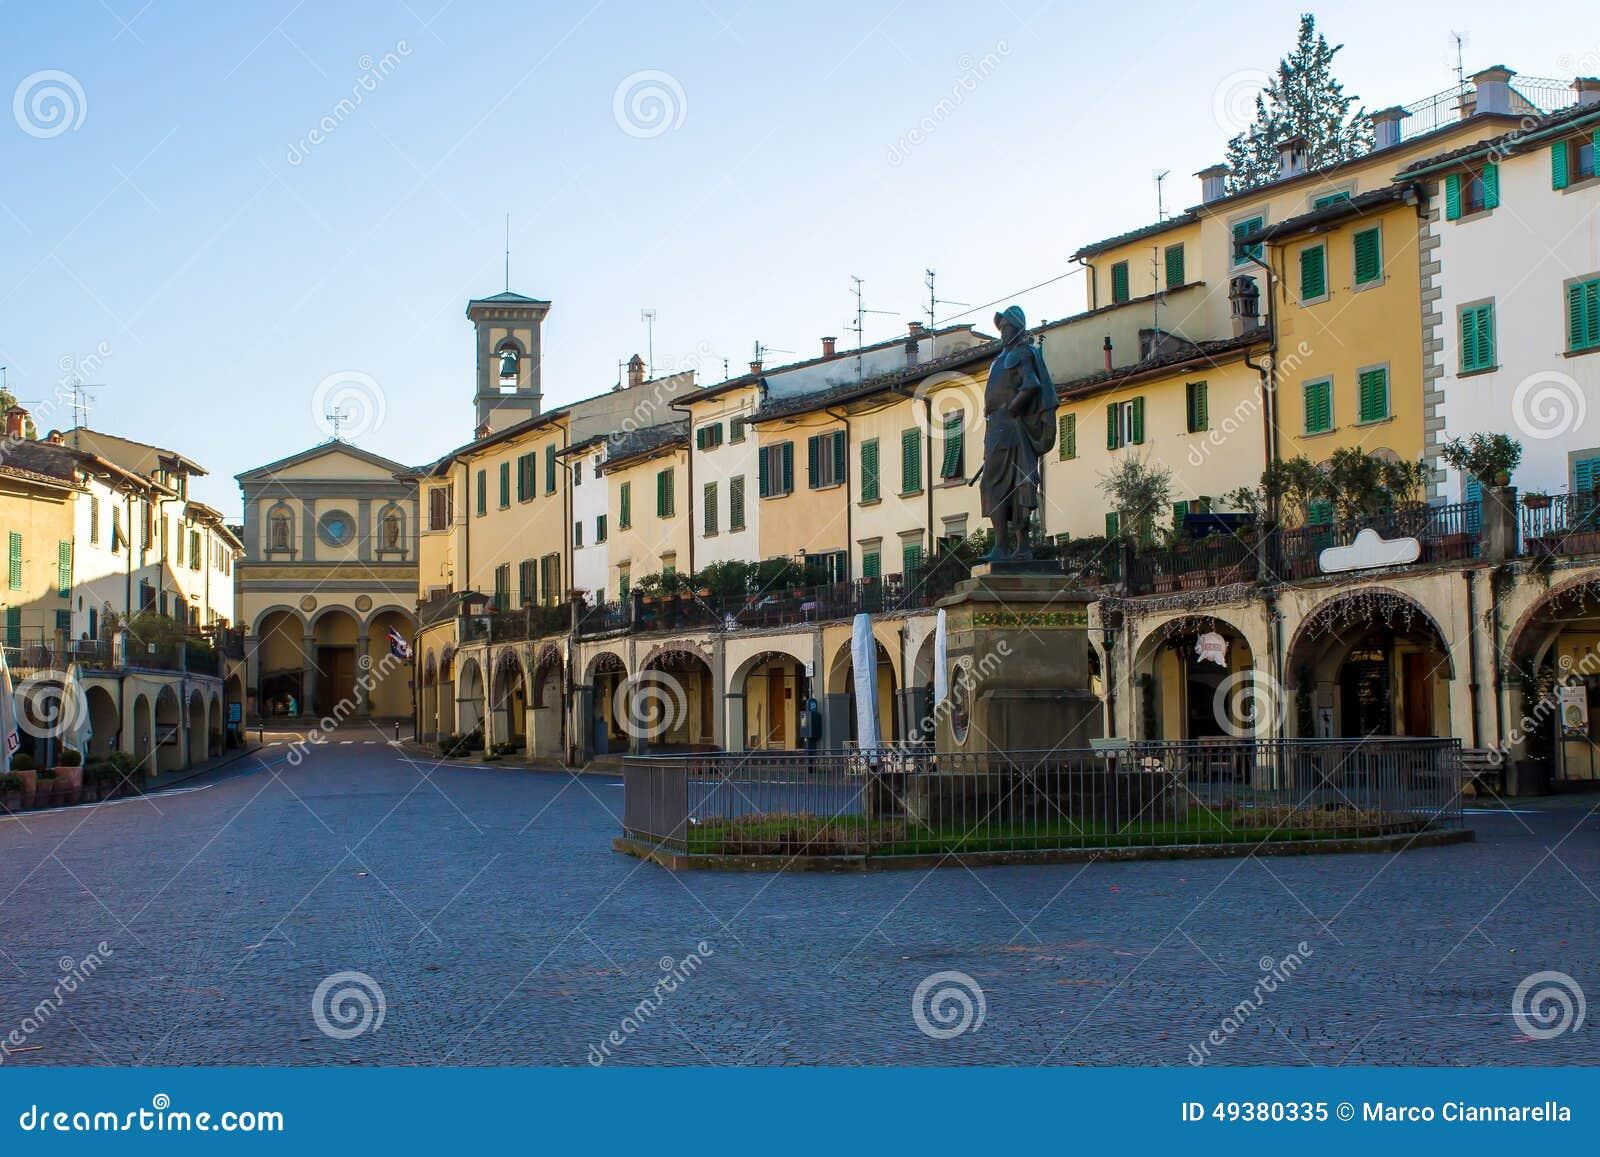 Karta Italien Chianti.Greve I Chianti Italien Fotografering For Bildbyraer Bild Av Wine